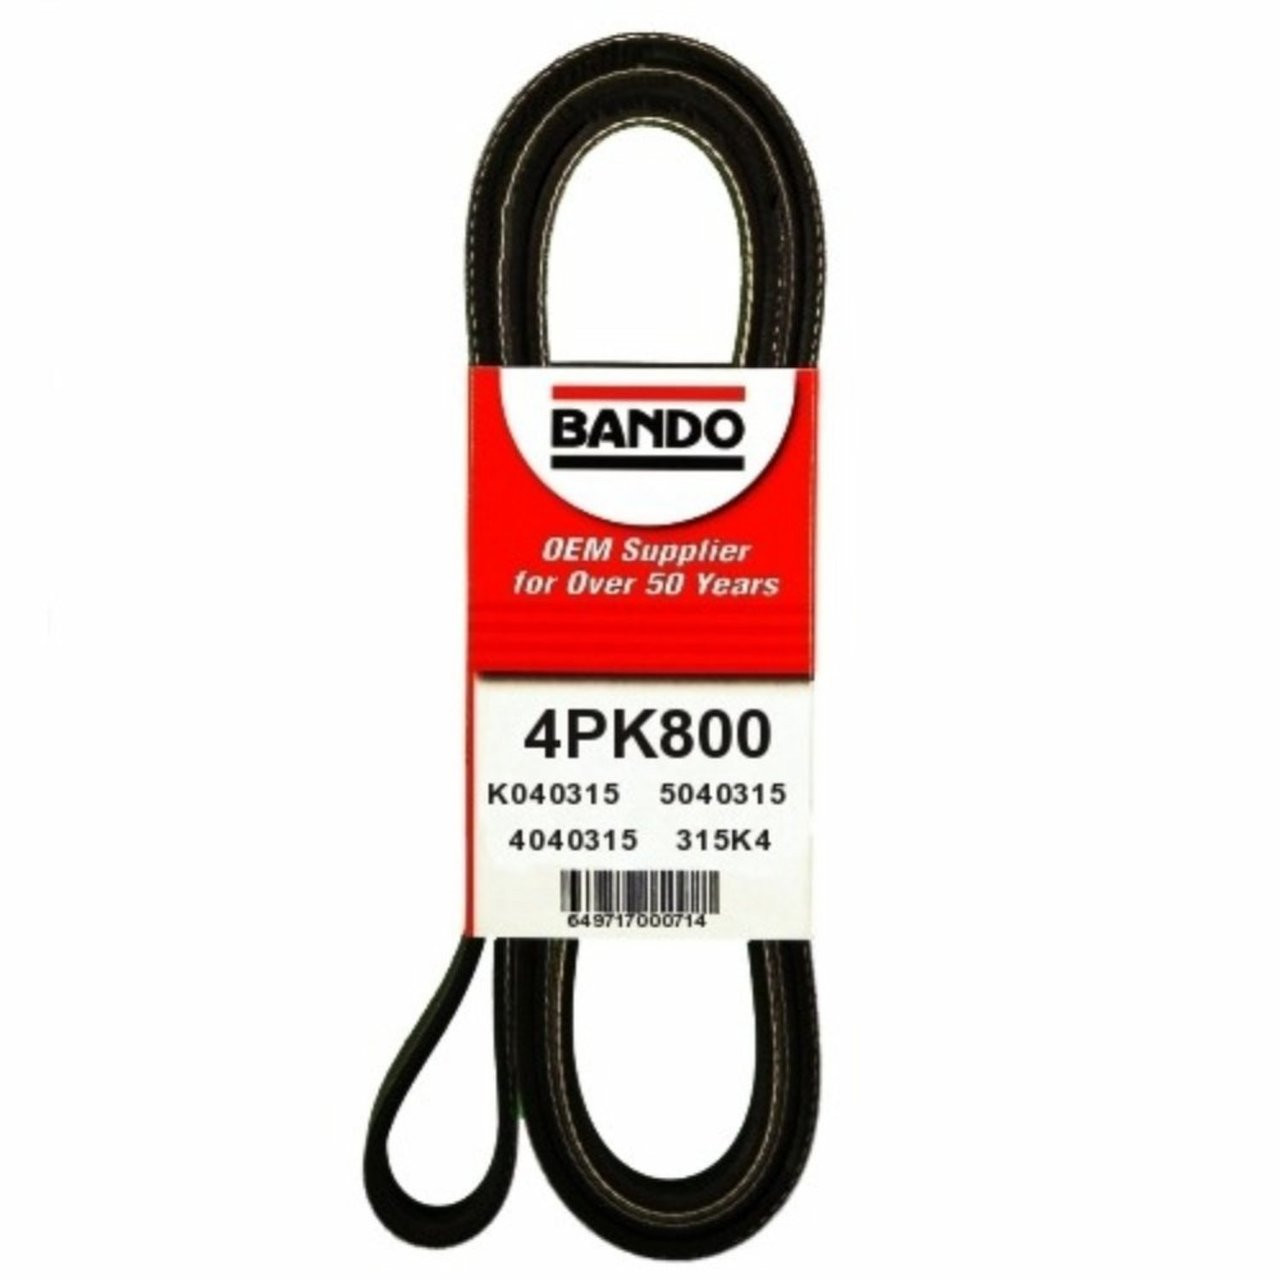 4pk800 oem equivalent serpentine belt for 1998 honda civic mechanidrive com [ 1280 x 1280 Pixel ]